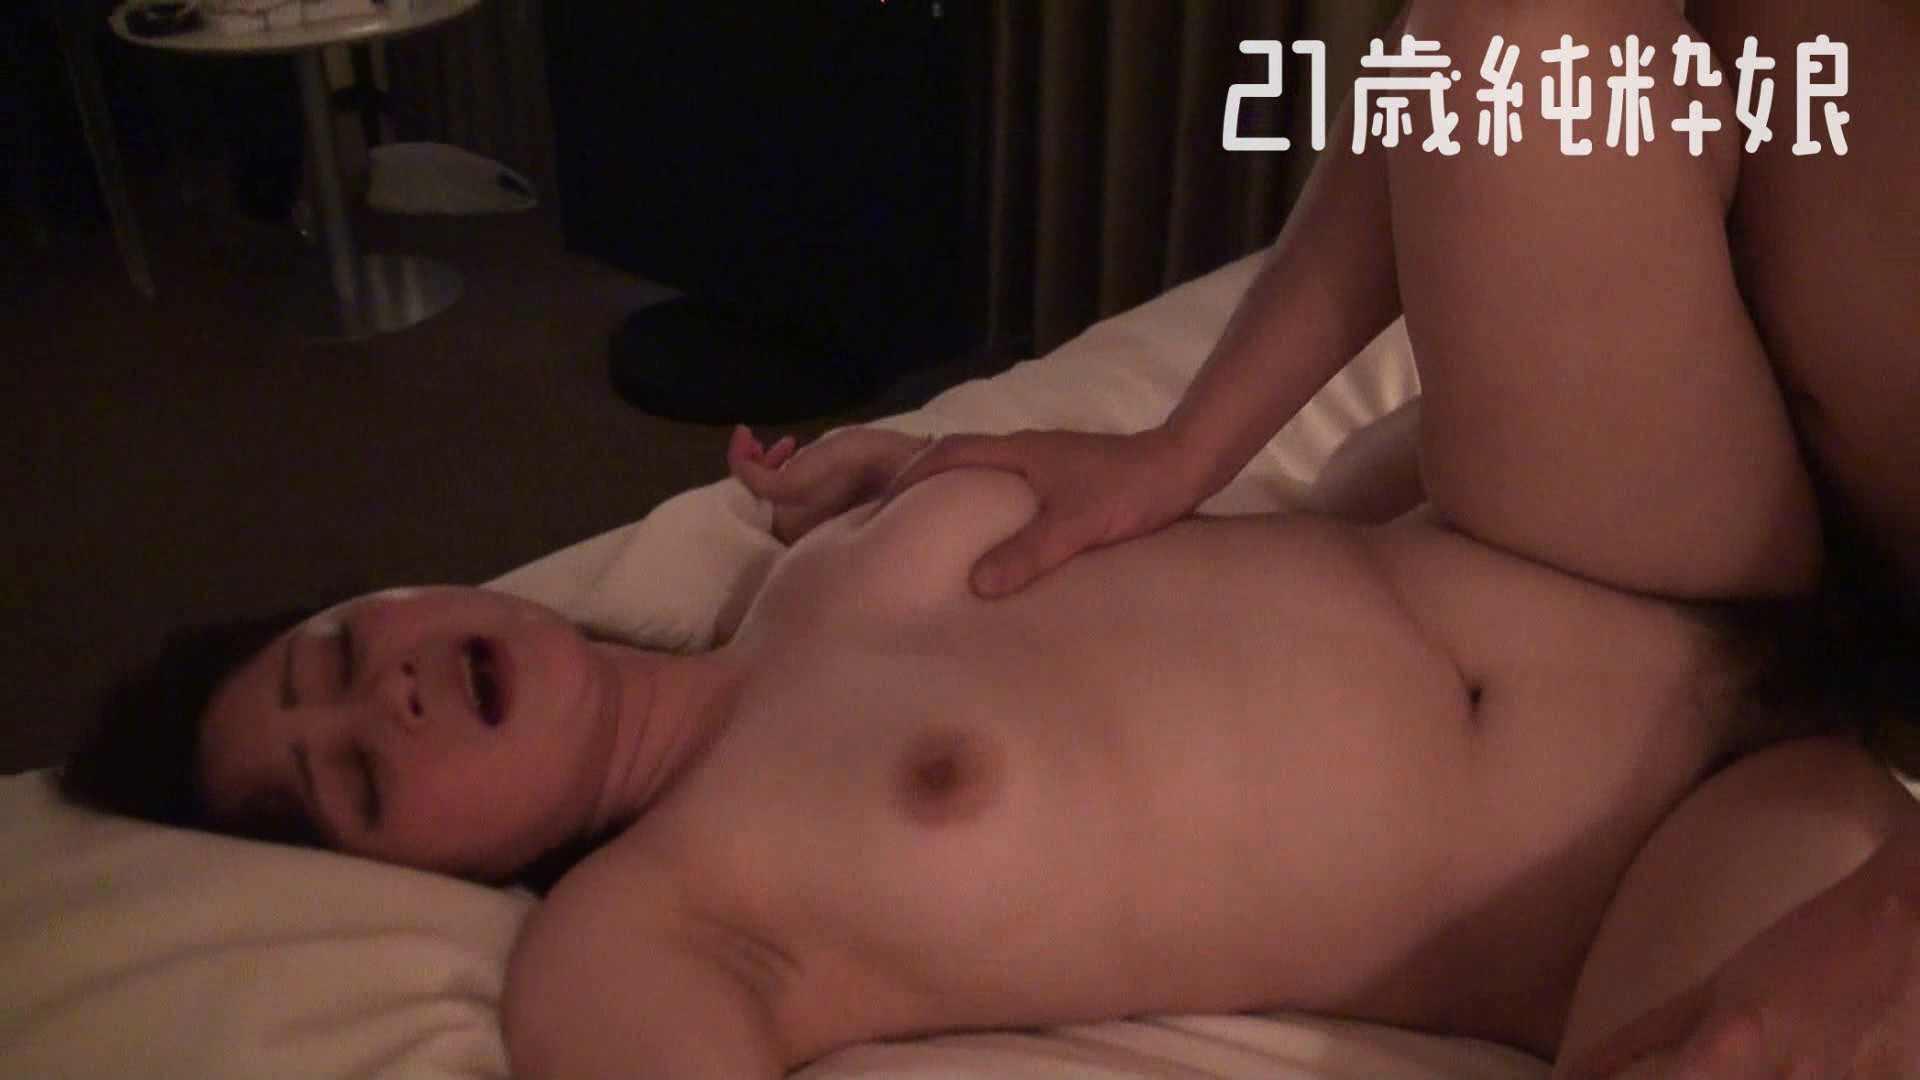 Gカップ21歳純粋嬢第2弾Vol.4 性欲 オマンコ動画キャプチャ 88連発 71